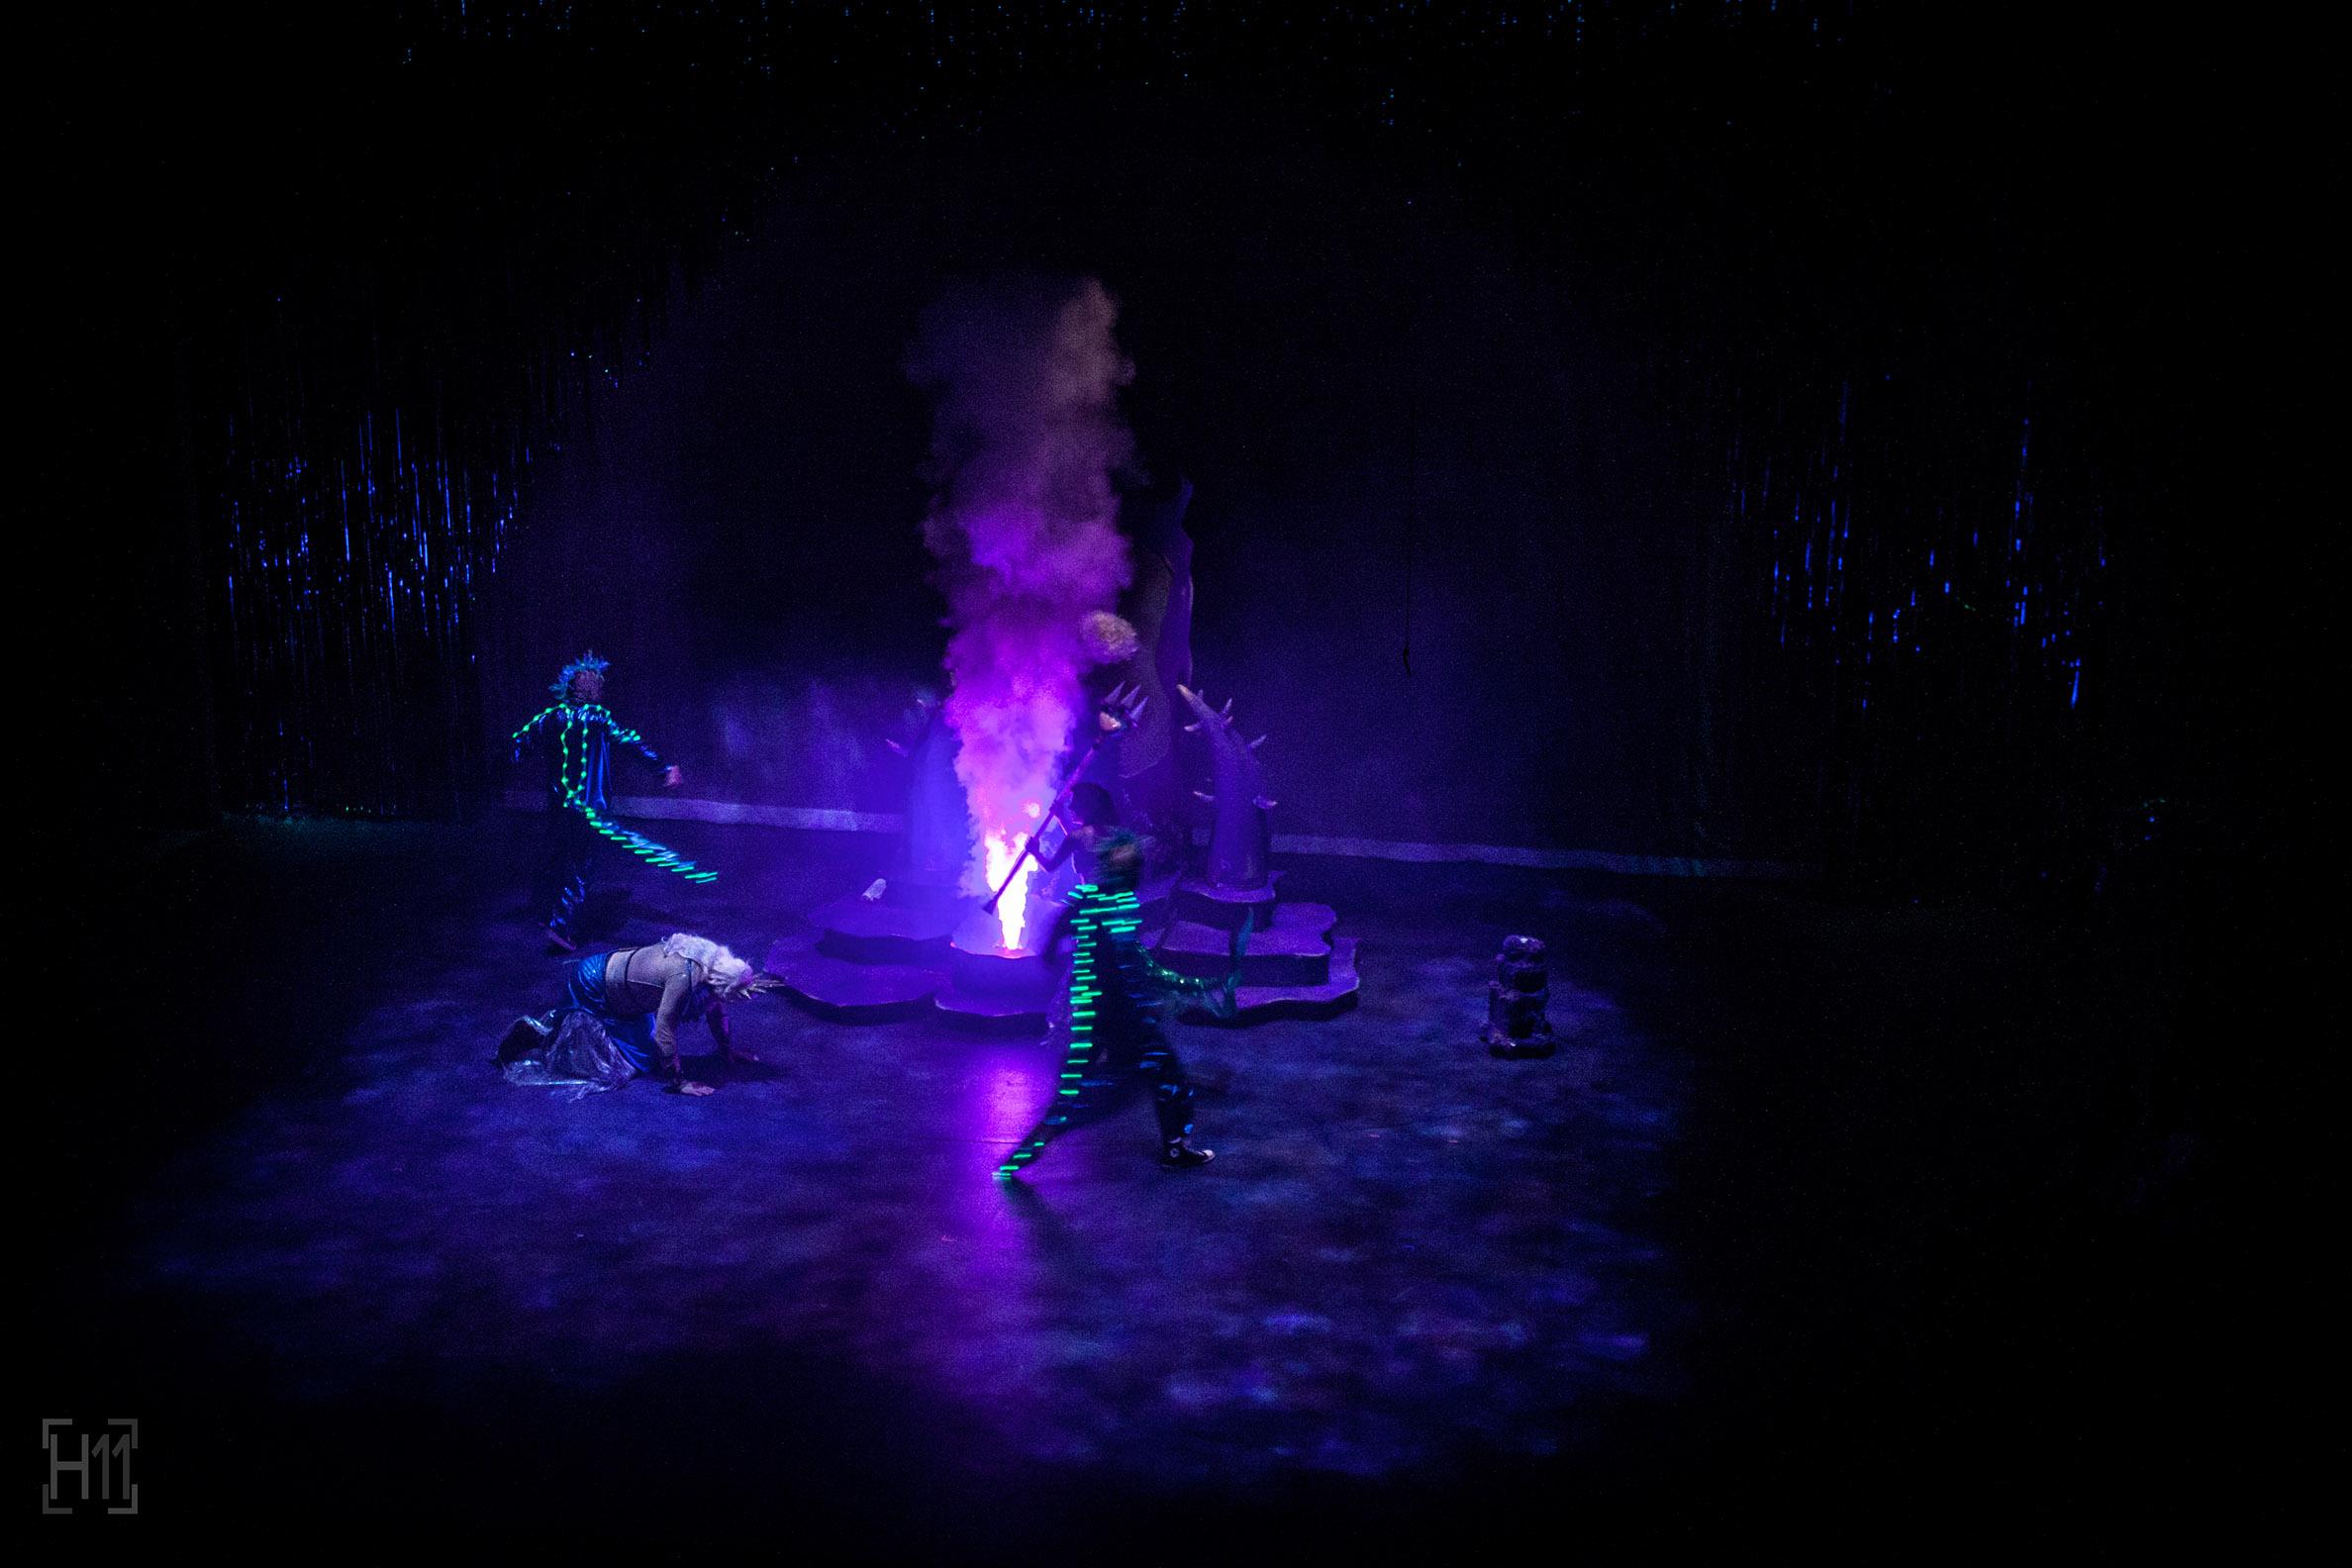 Mermaid_Fullstage (253 of 279)